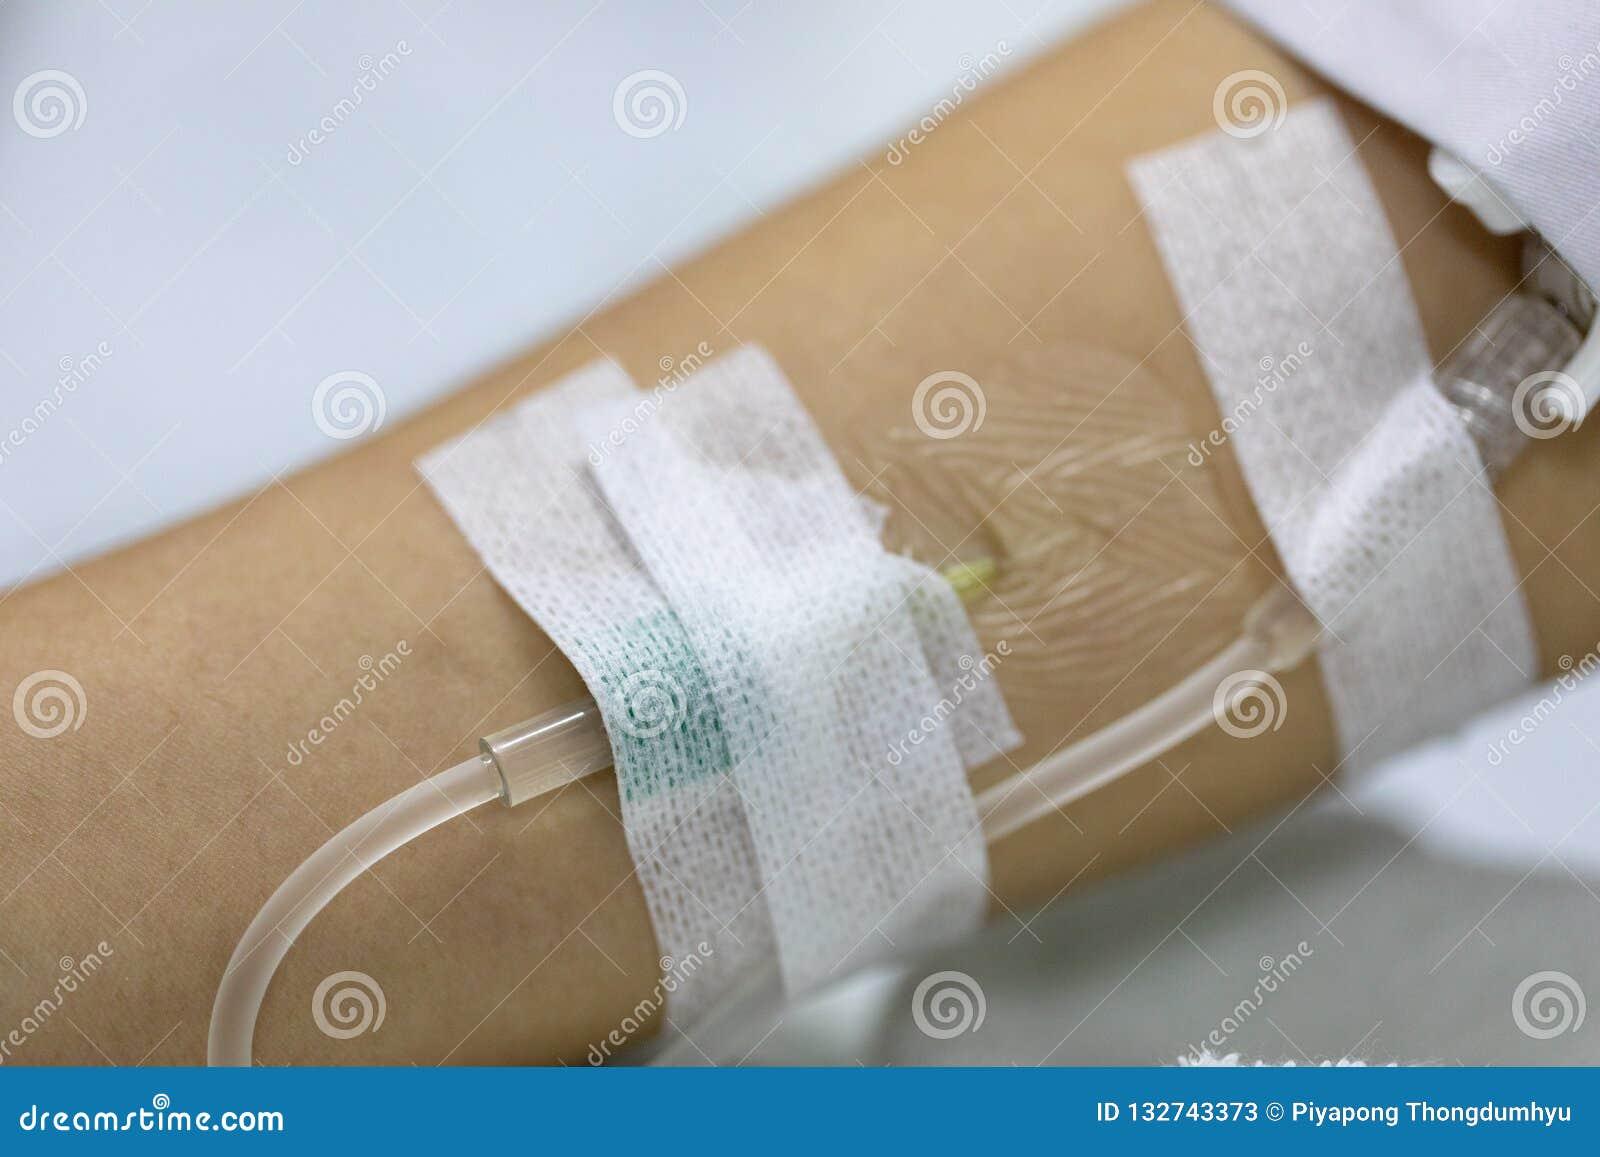 Saline injection bondage woman